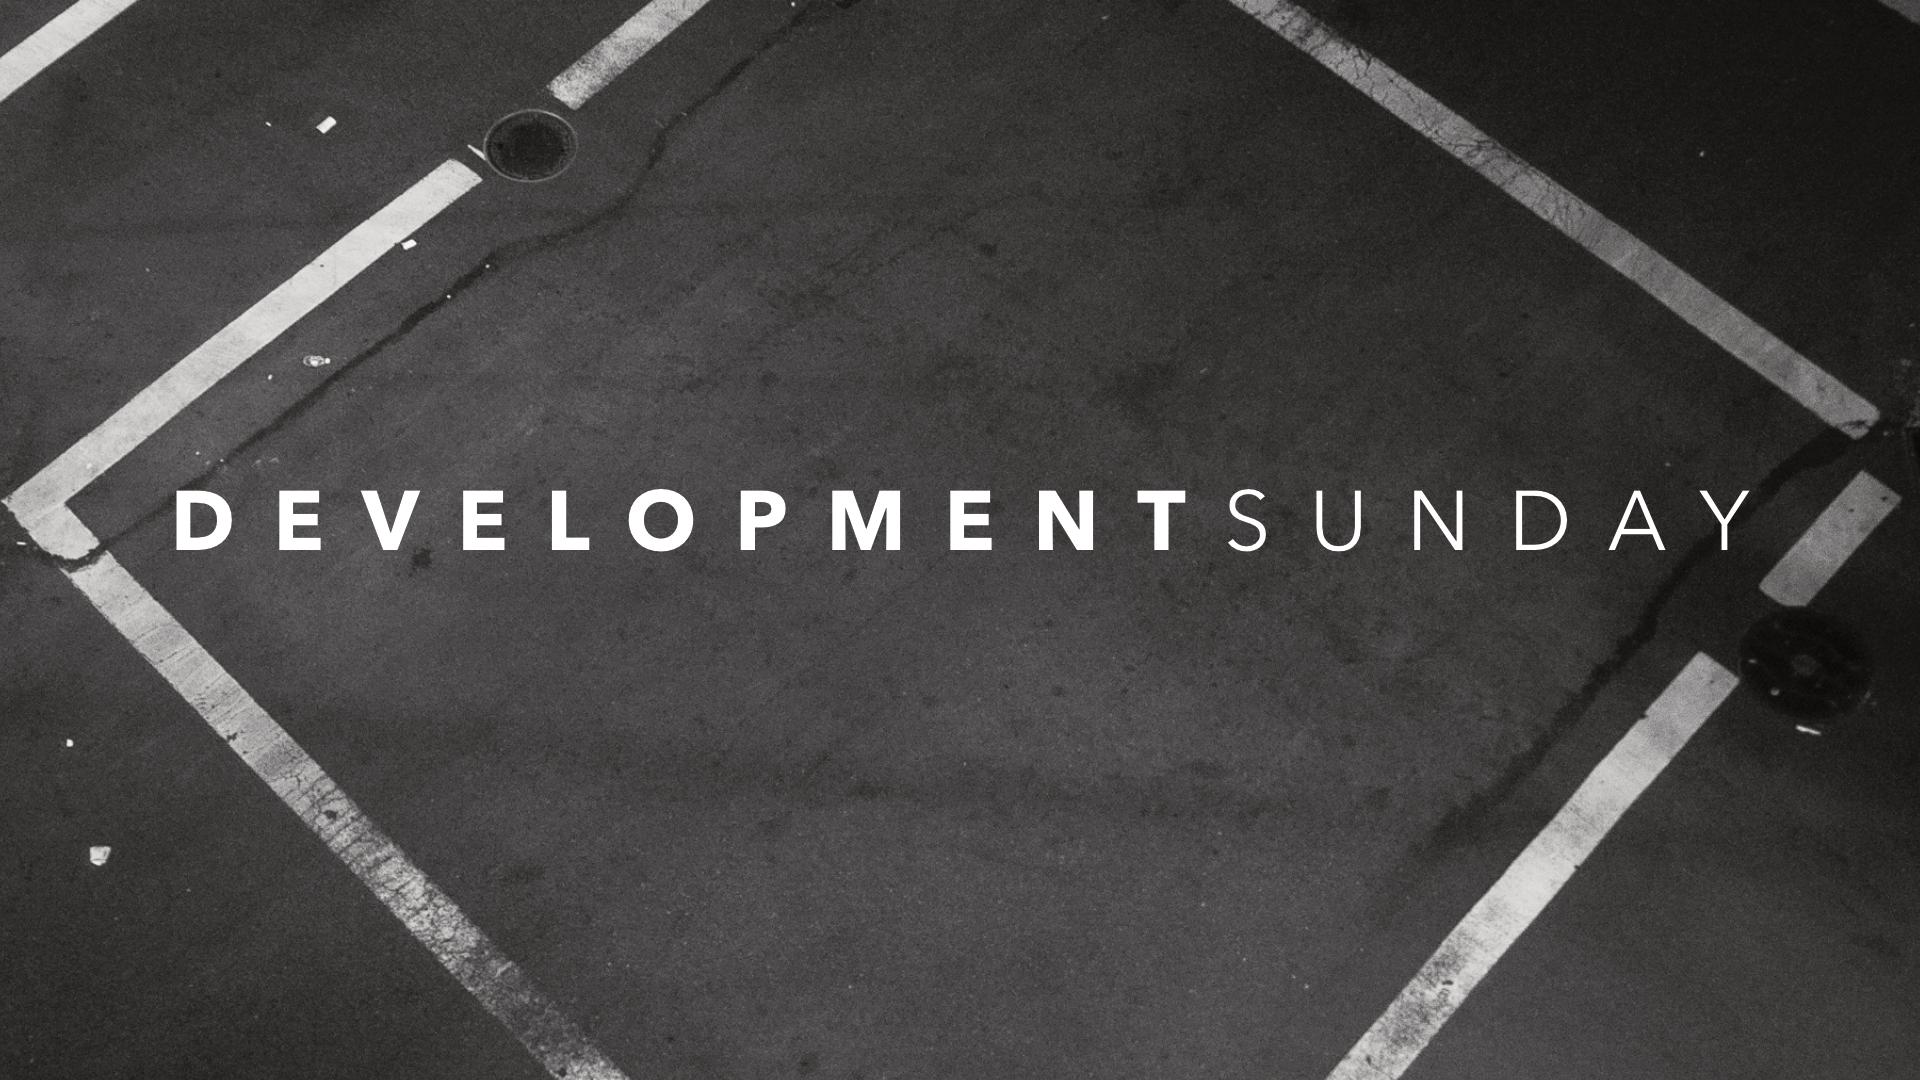 Development Sunday.png